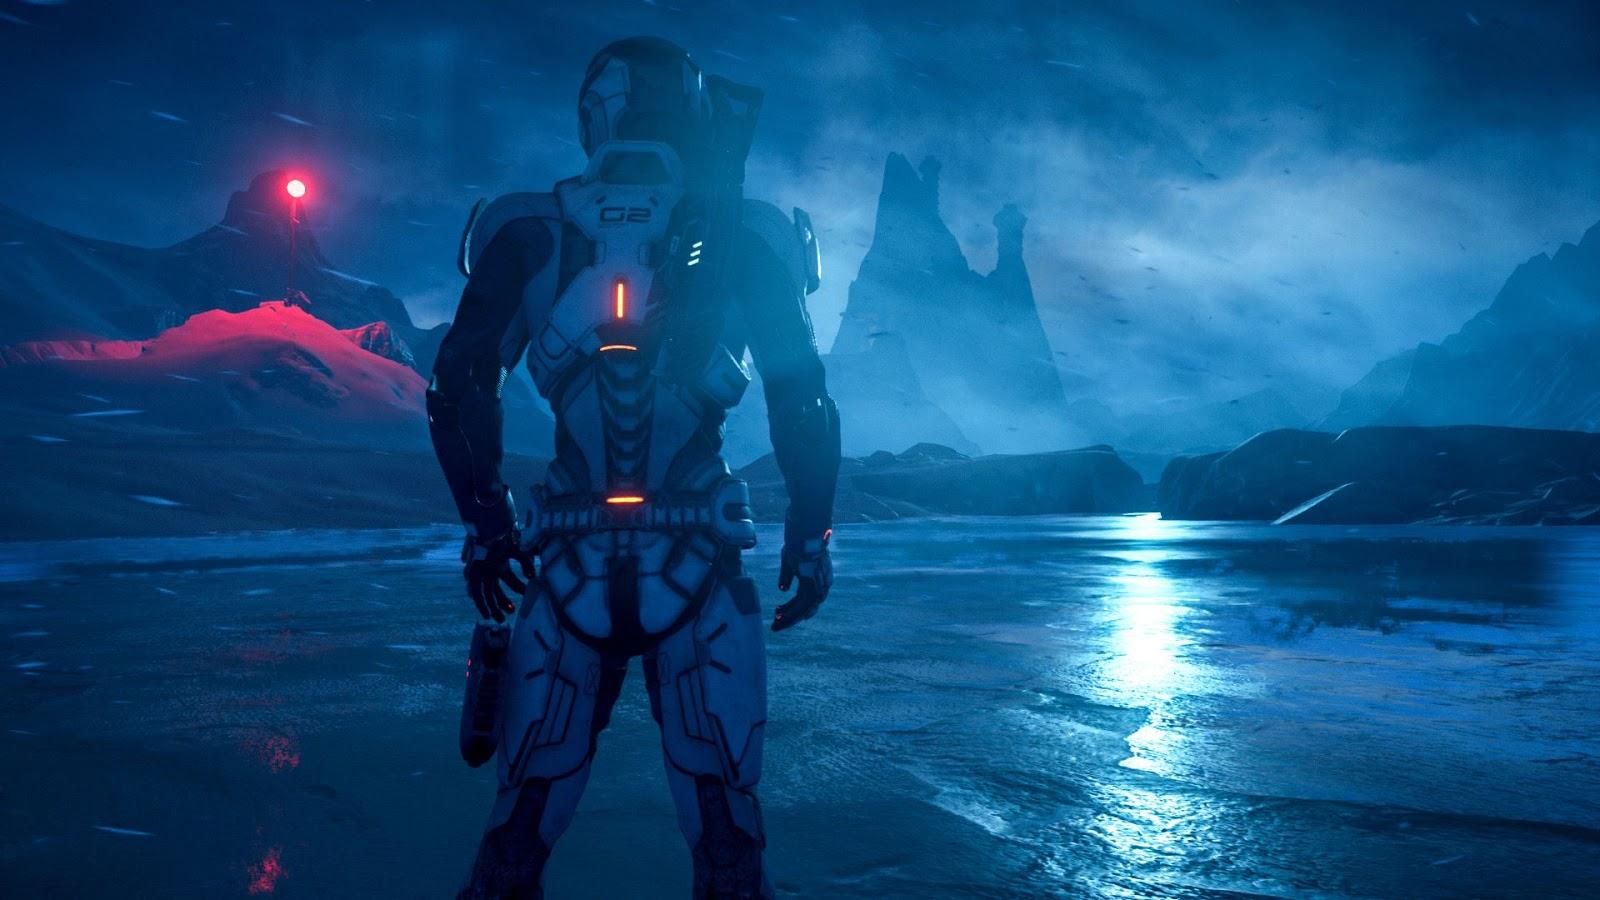 Mass Effect Andromeda ESPAÑOL PC Full + Update 1.0.0.5 + CRACKFIX (CPY) + REPACK PROPER 9 DVD5 (JPW) 6